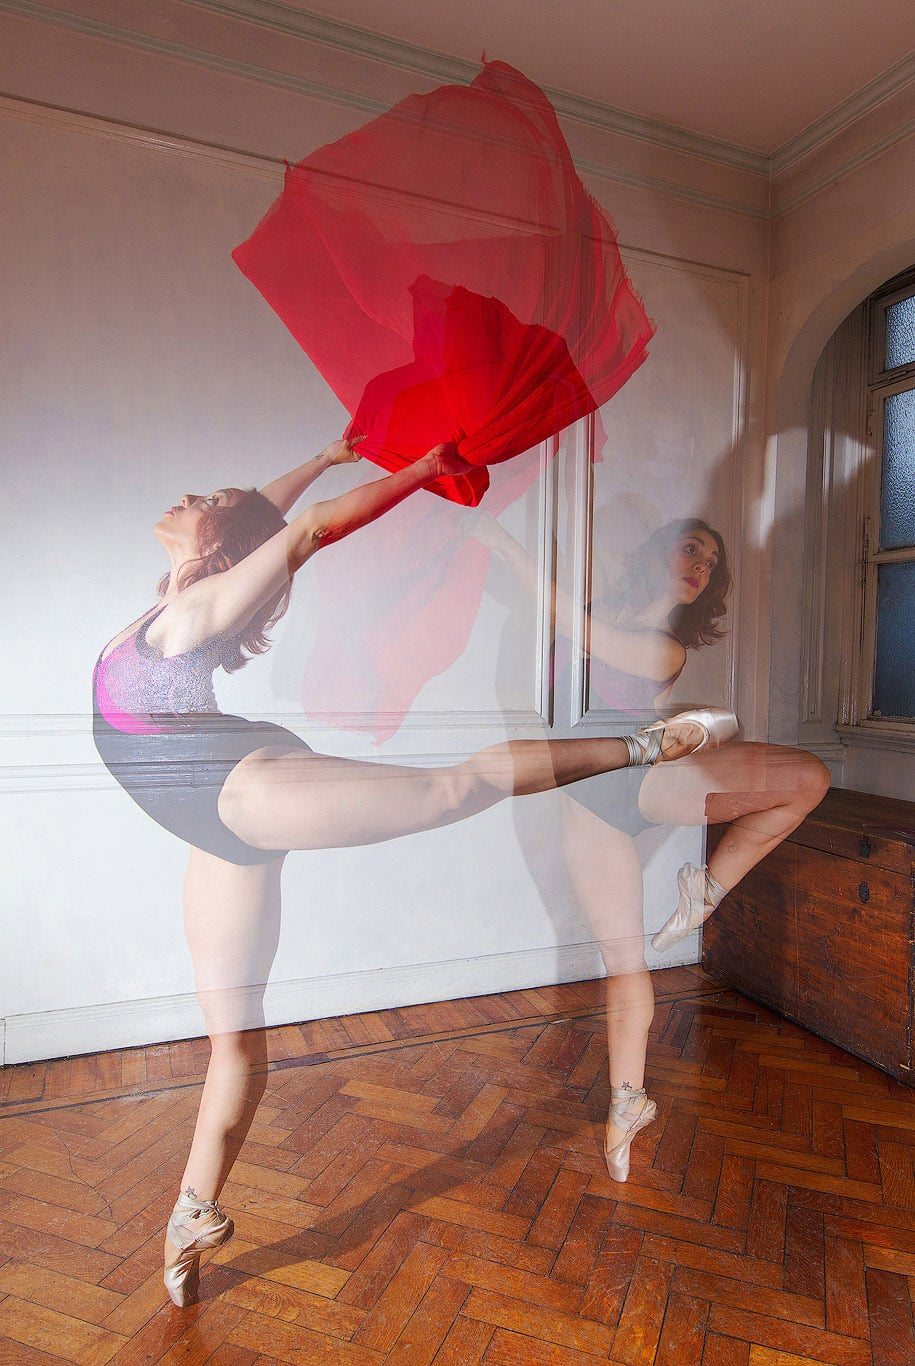 Victoria phot shoot dancer, Buenos Aires